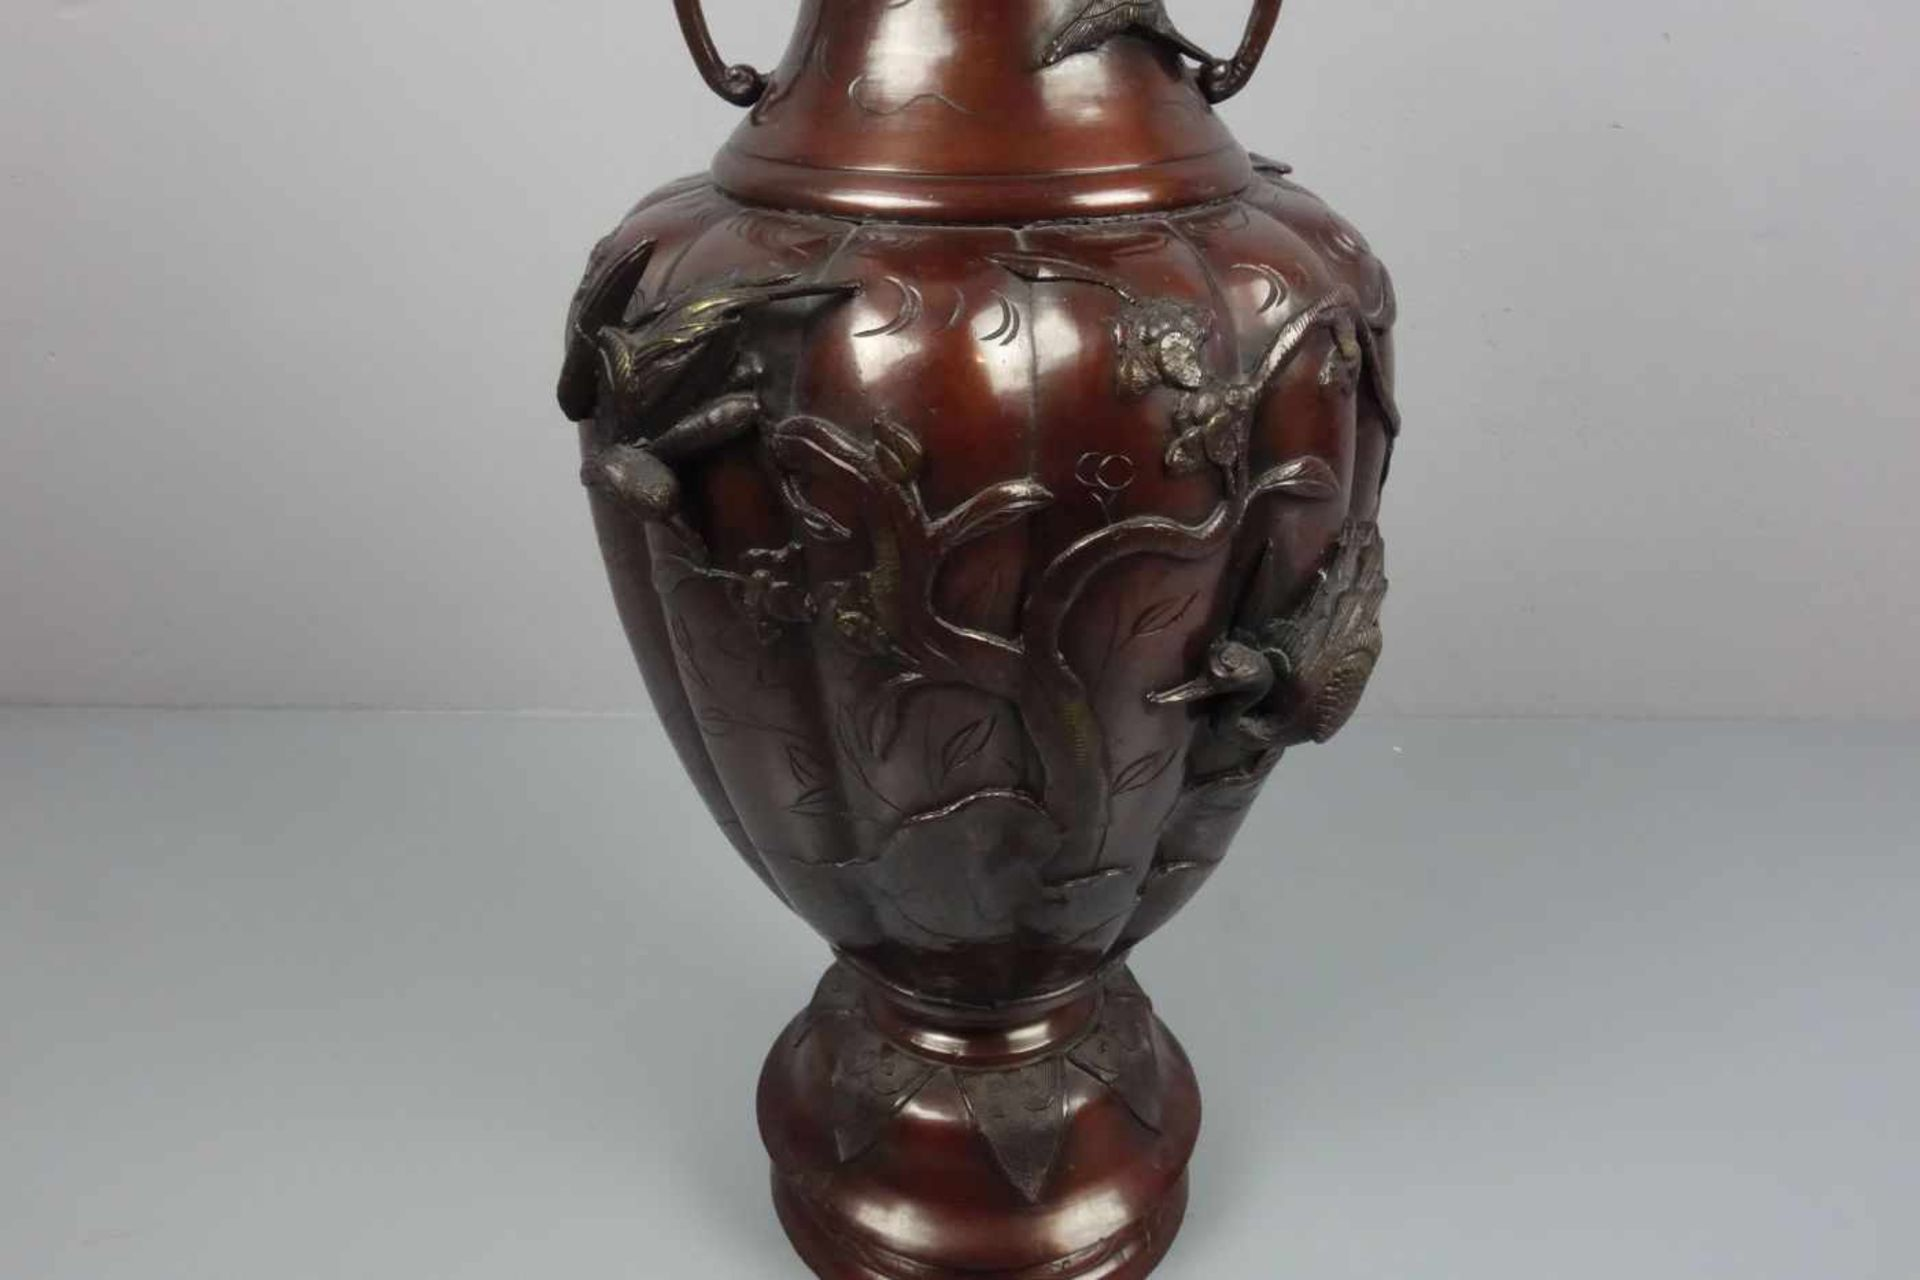 Los 174 - BODENVASE AUS METALL / chinese metal vase, China, 20. Jh., brüniertes Metall, unter dem Stand mit...